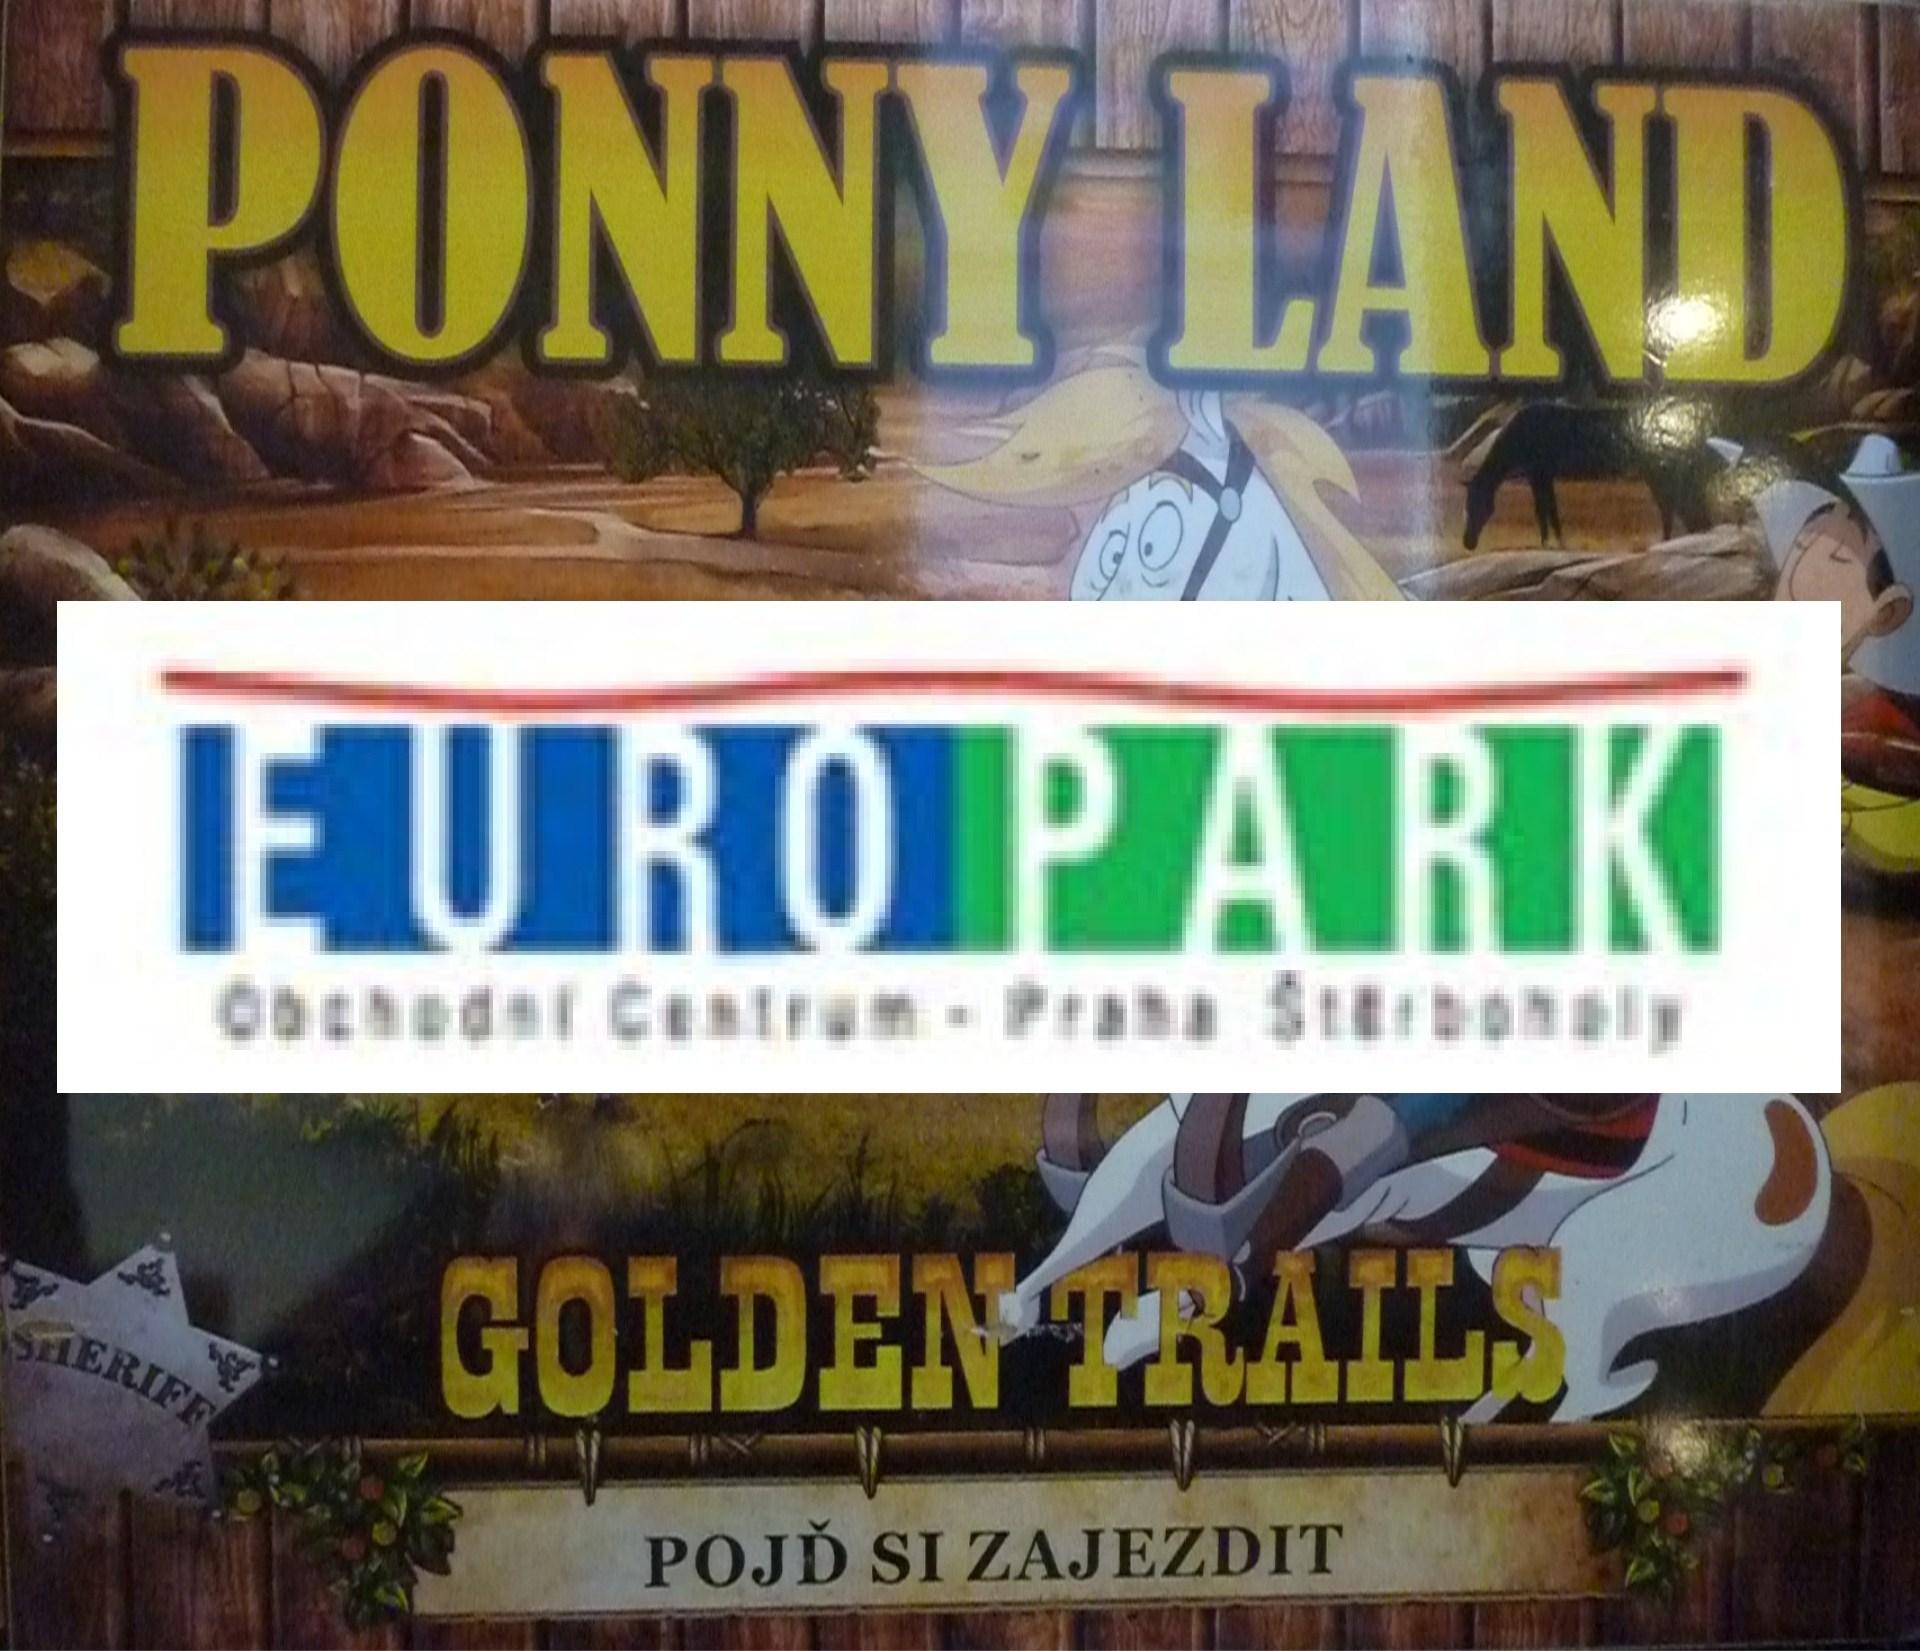 Praha - PONNY LAND